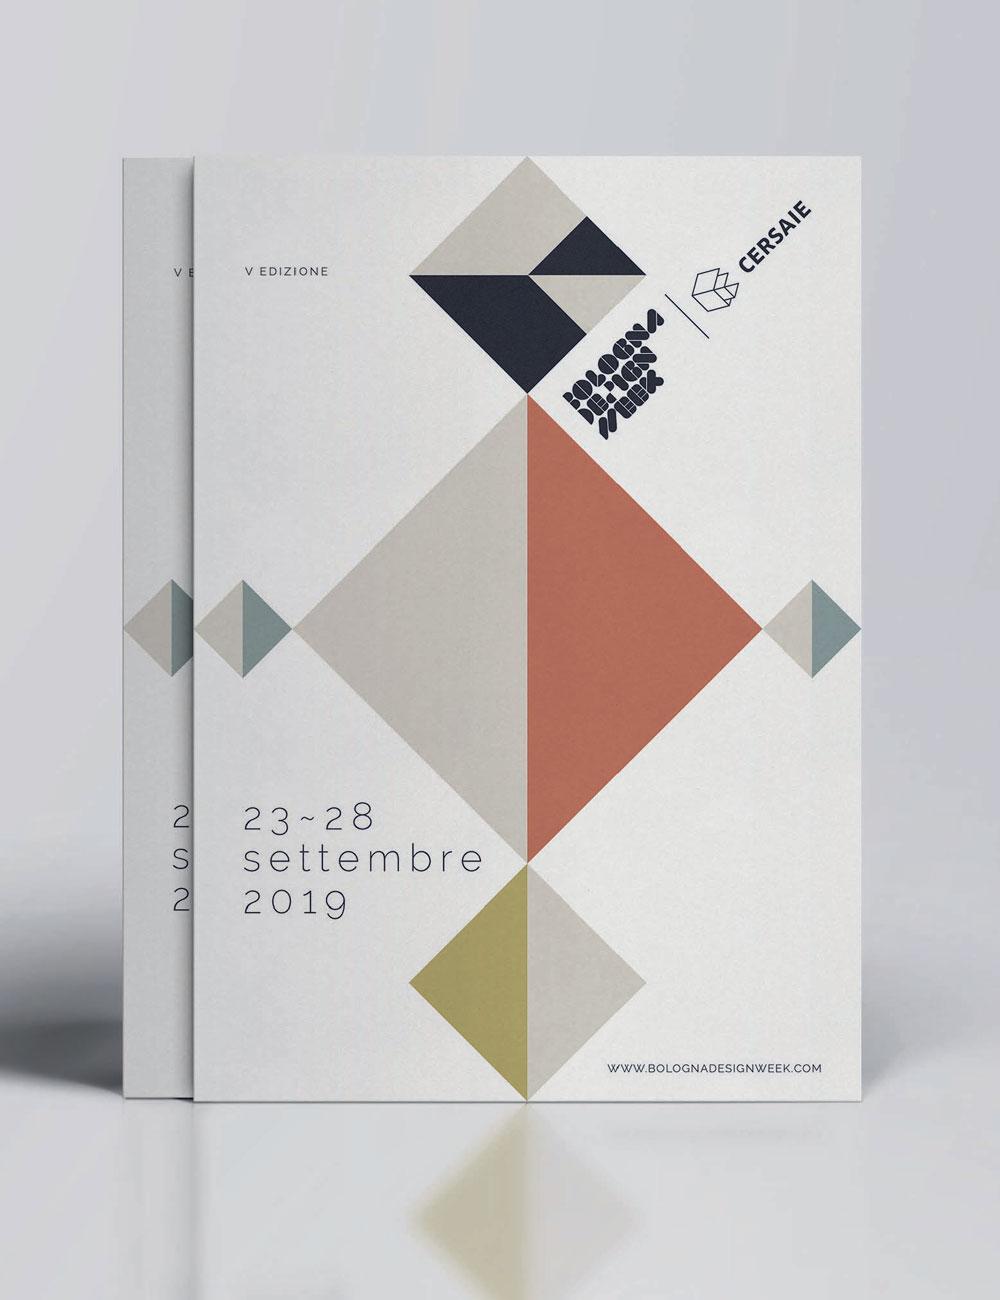 Tasini @ Bologna design week